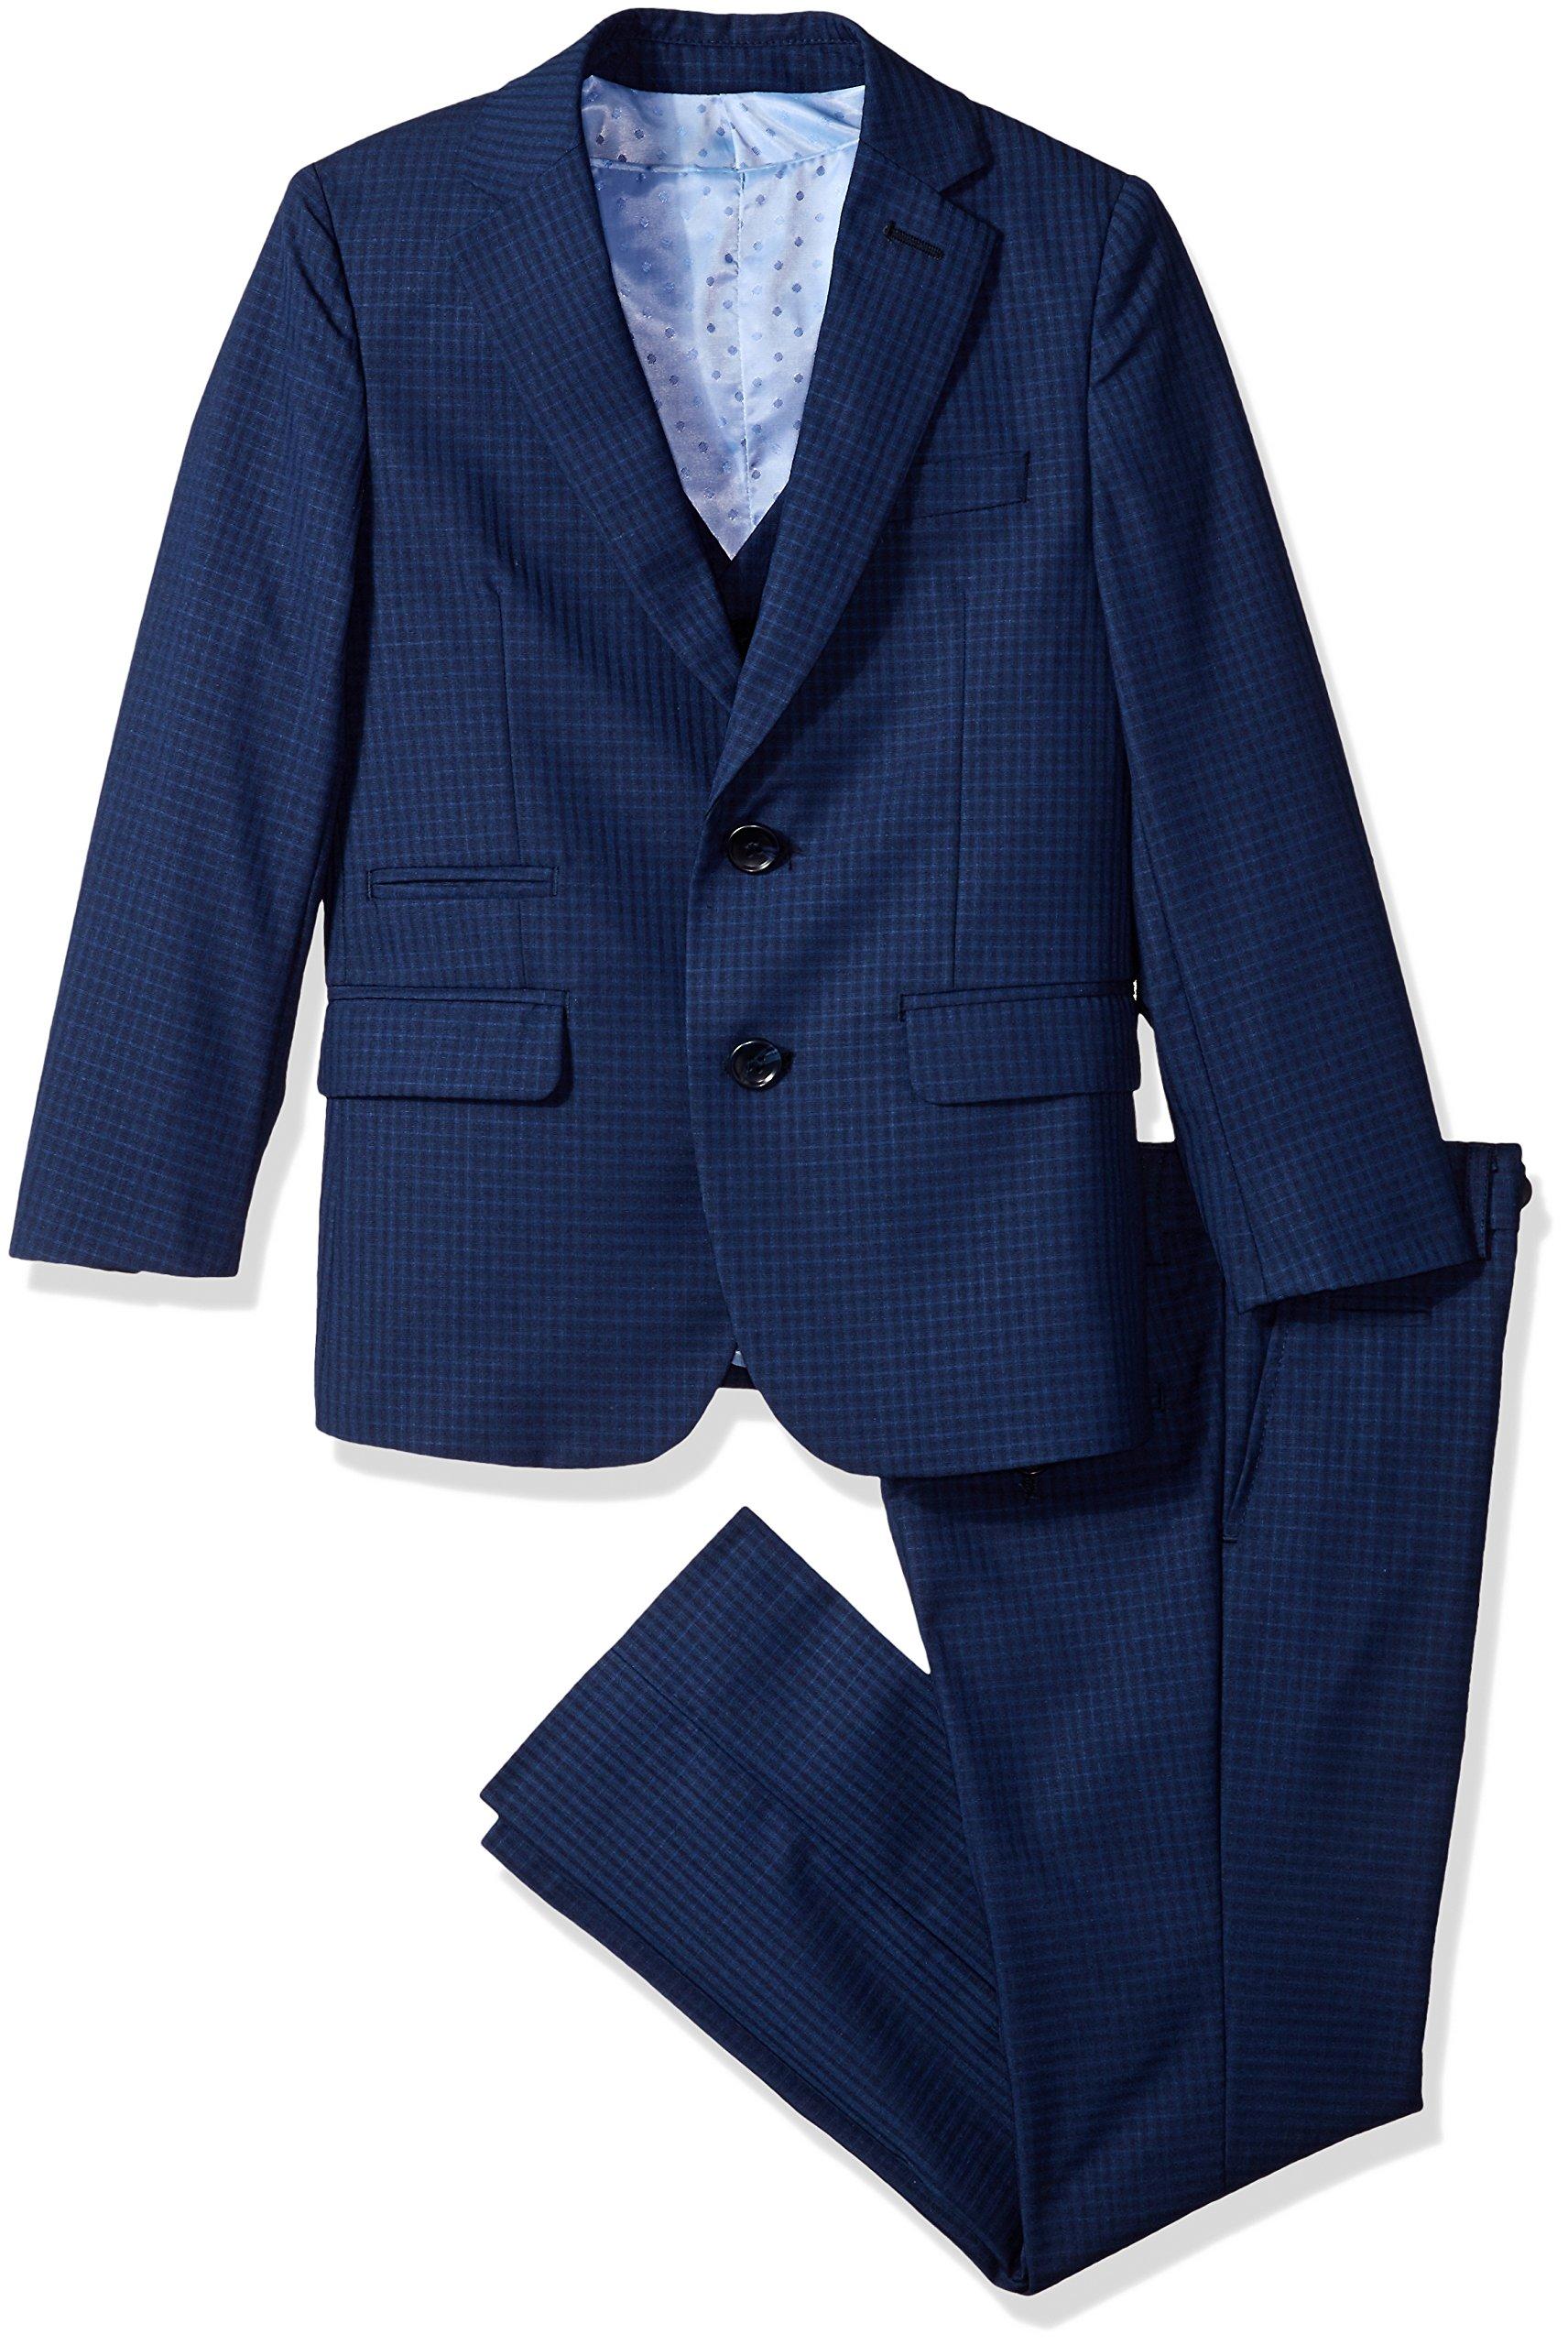 Isaac Mizrahi Big Boys' Slim Gingham Check 3pc Suit, Navy, 10 by Isaac Mizrahi